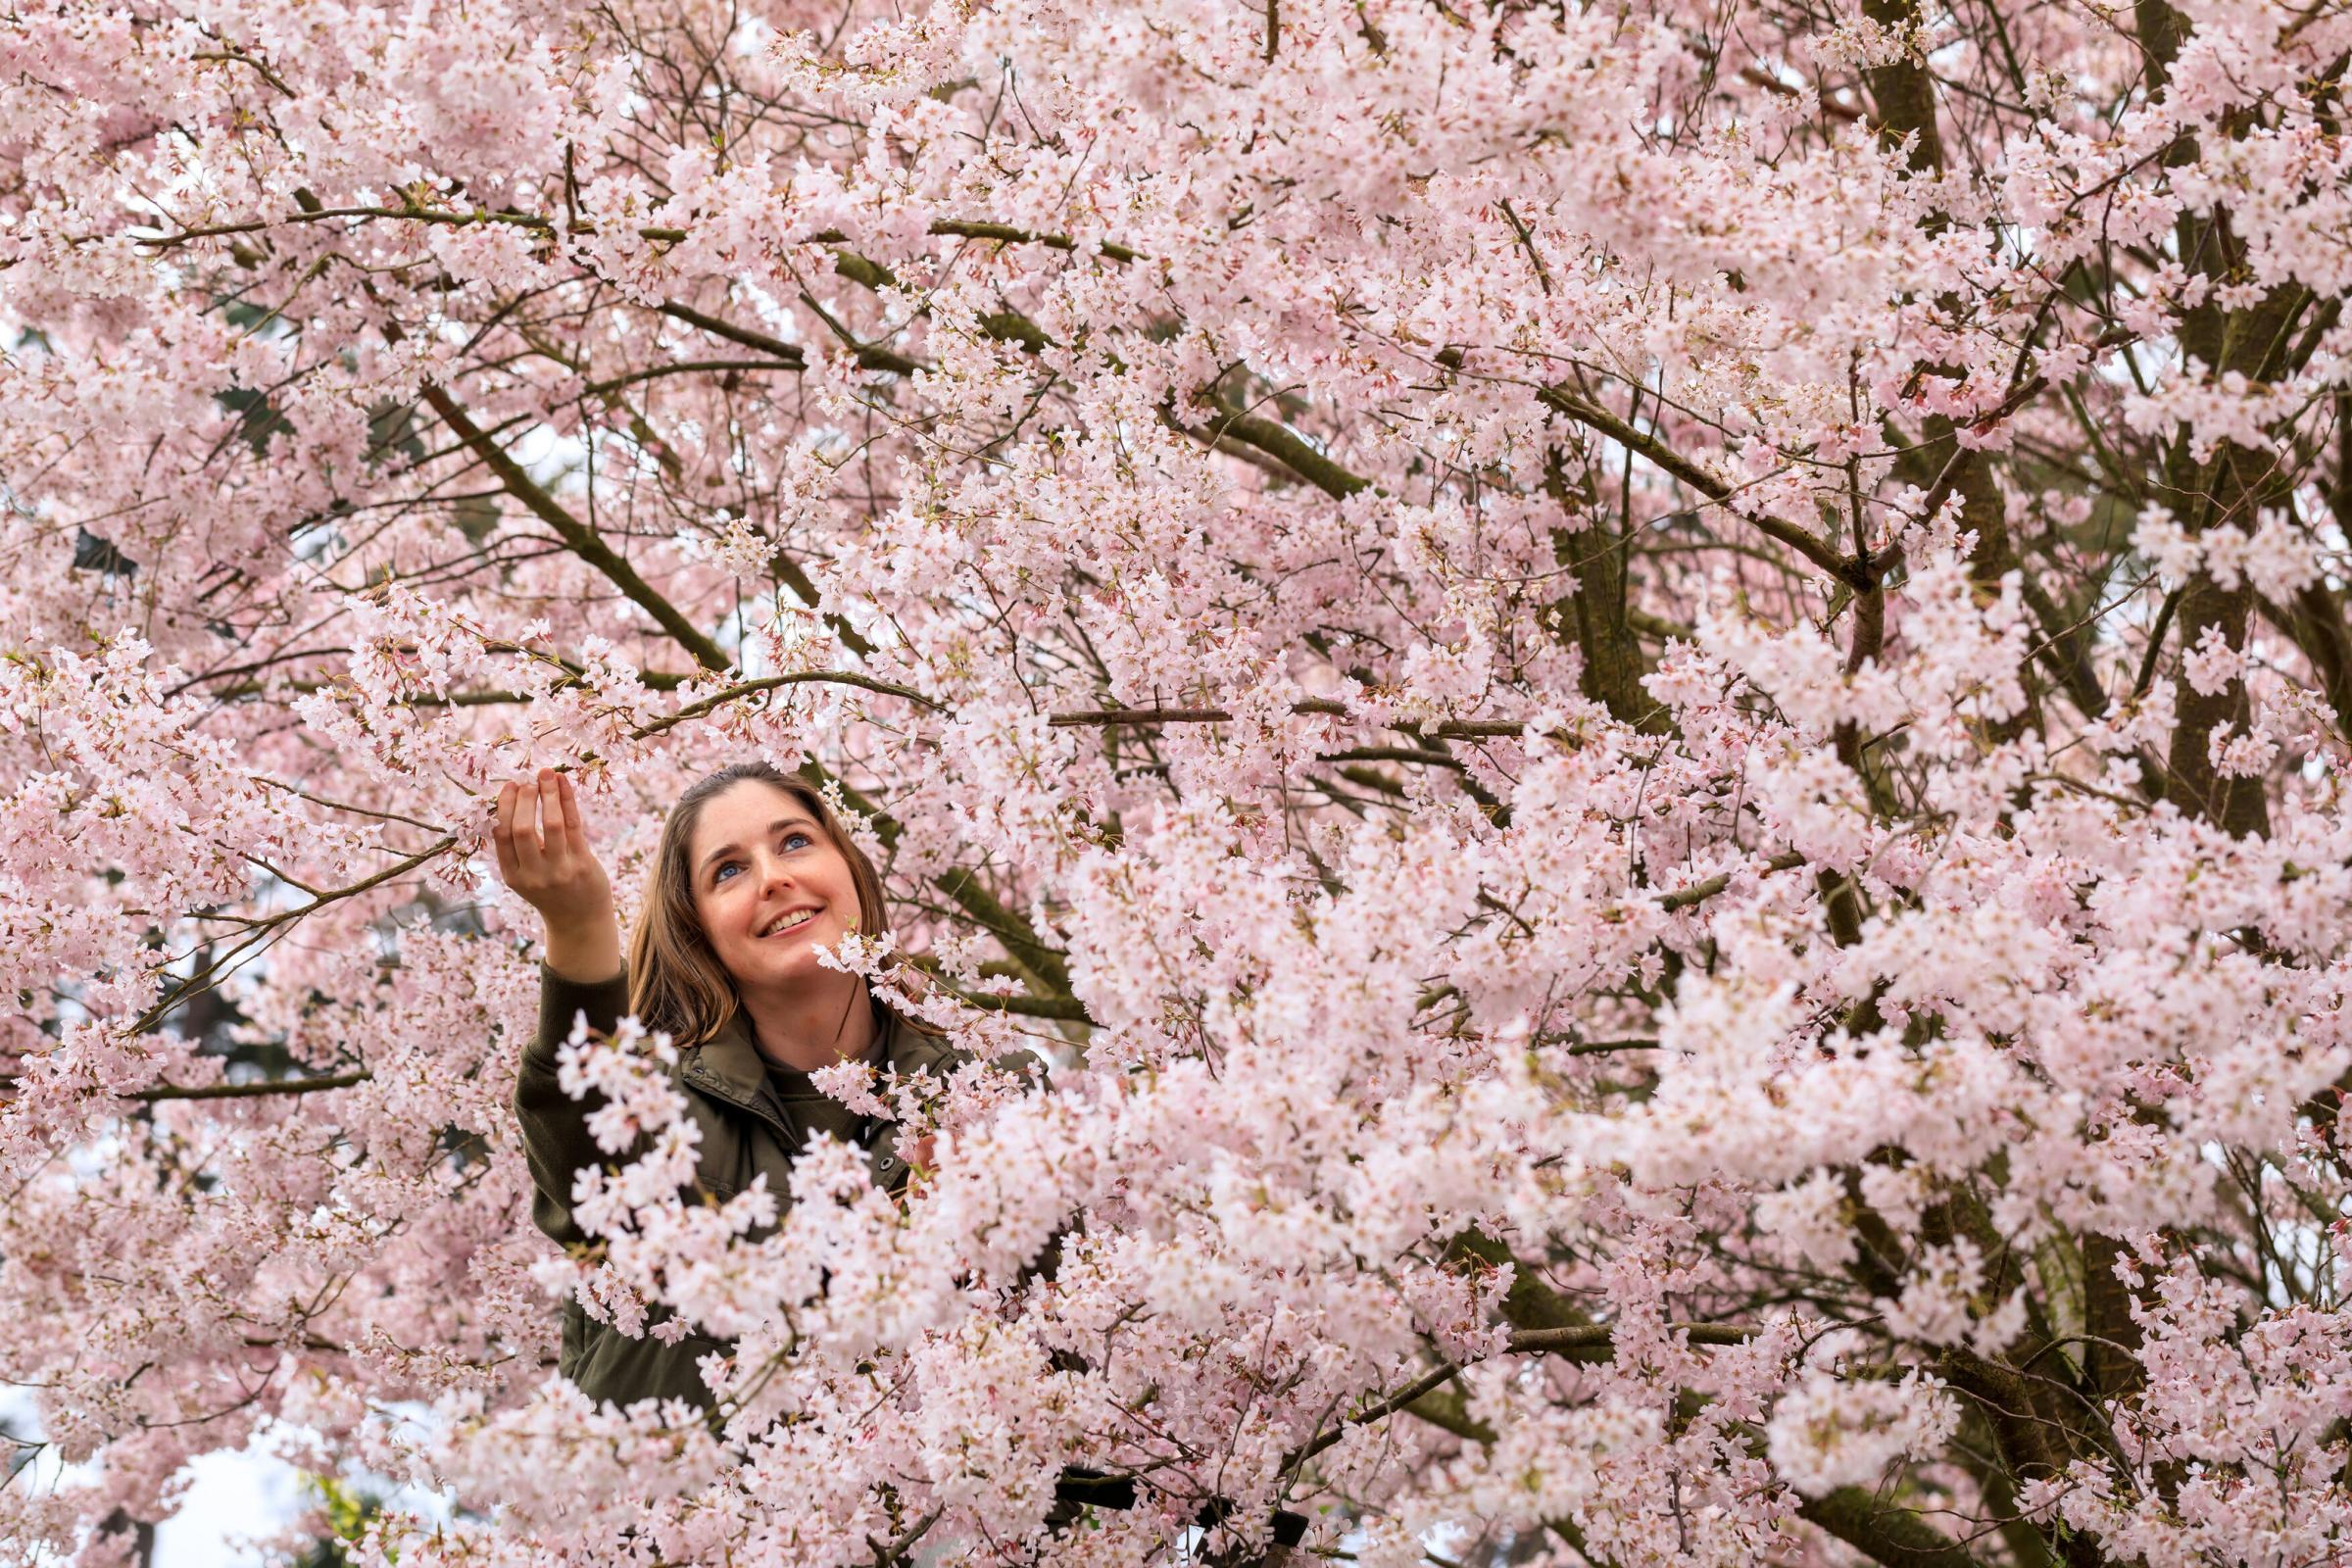 Gardening Celebrate Cherry Blossom Season By Planting A Cherry Tree Of Your Own Heraldscotland